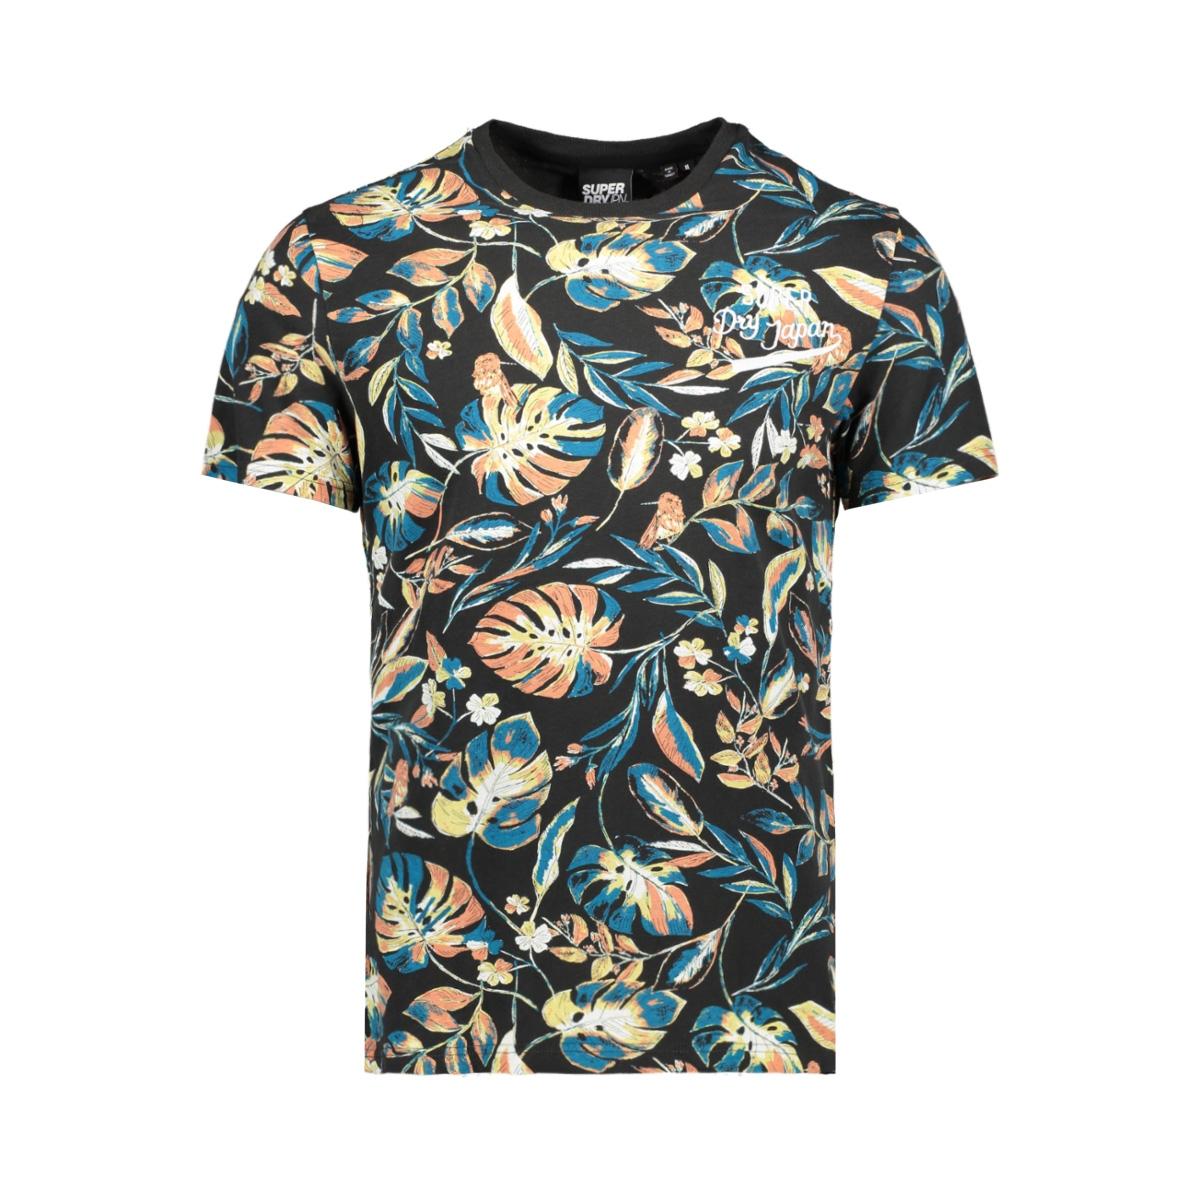 aop supply tee m1010191a superdry t-shirt black aop